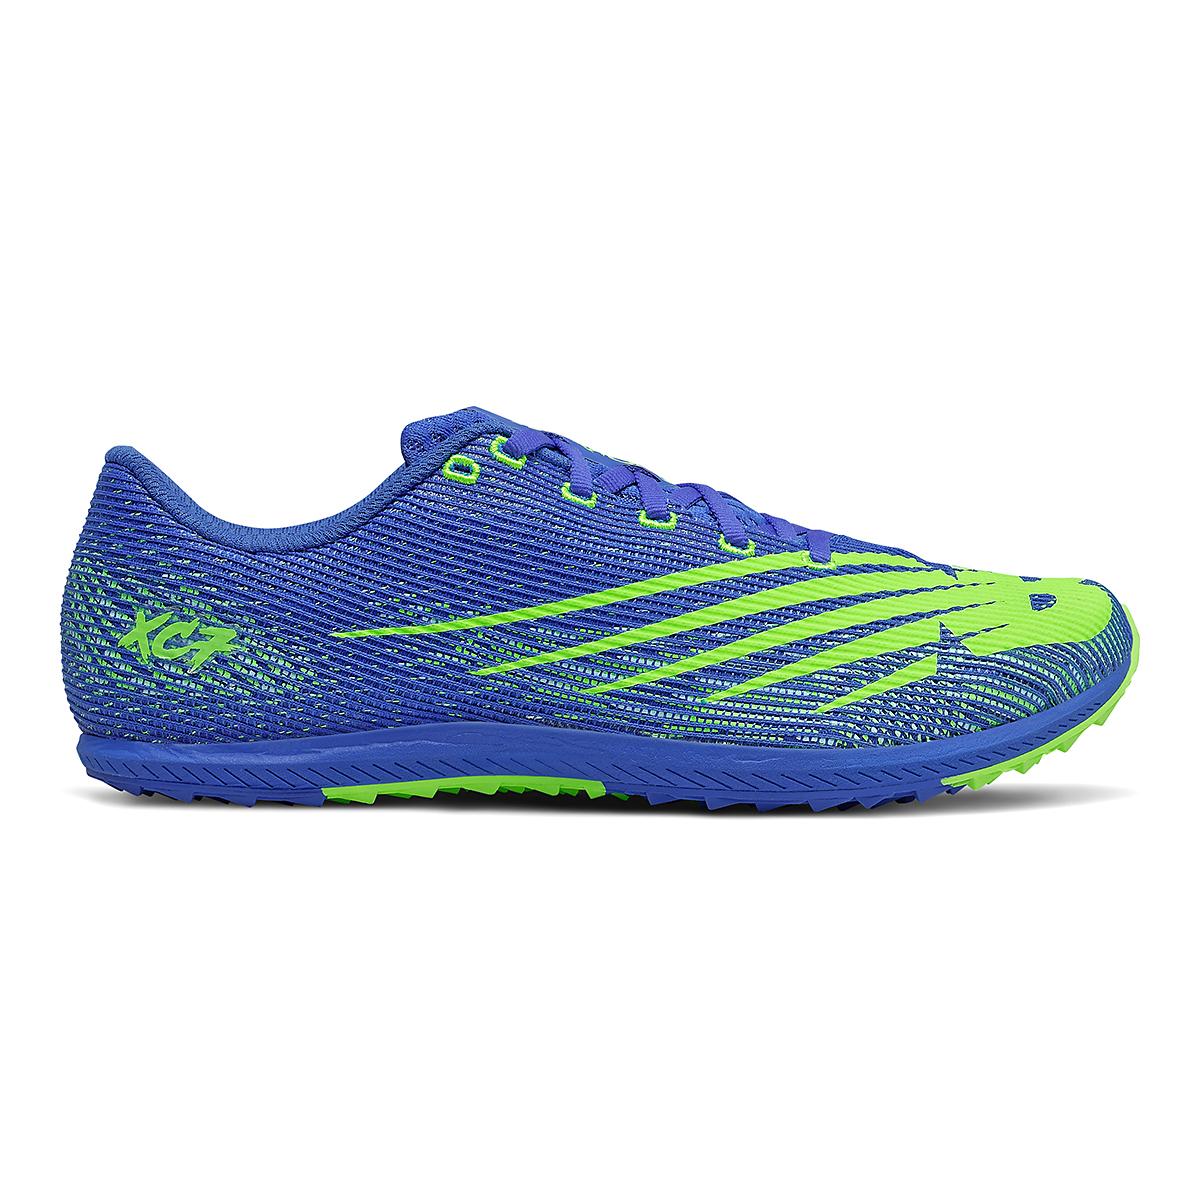 Men's New Balance XC Seven v3 Spikeless Shoe - Color: Cobalt/Energy Lime - Size: 7 - Width: Regular, Cobalt/Energy Lime, large, image 1